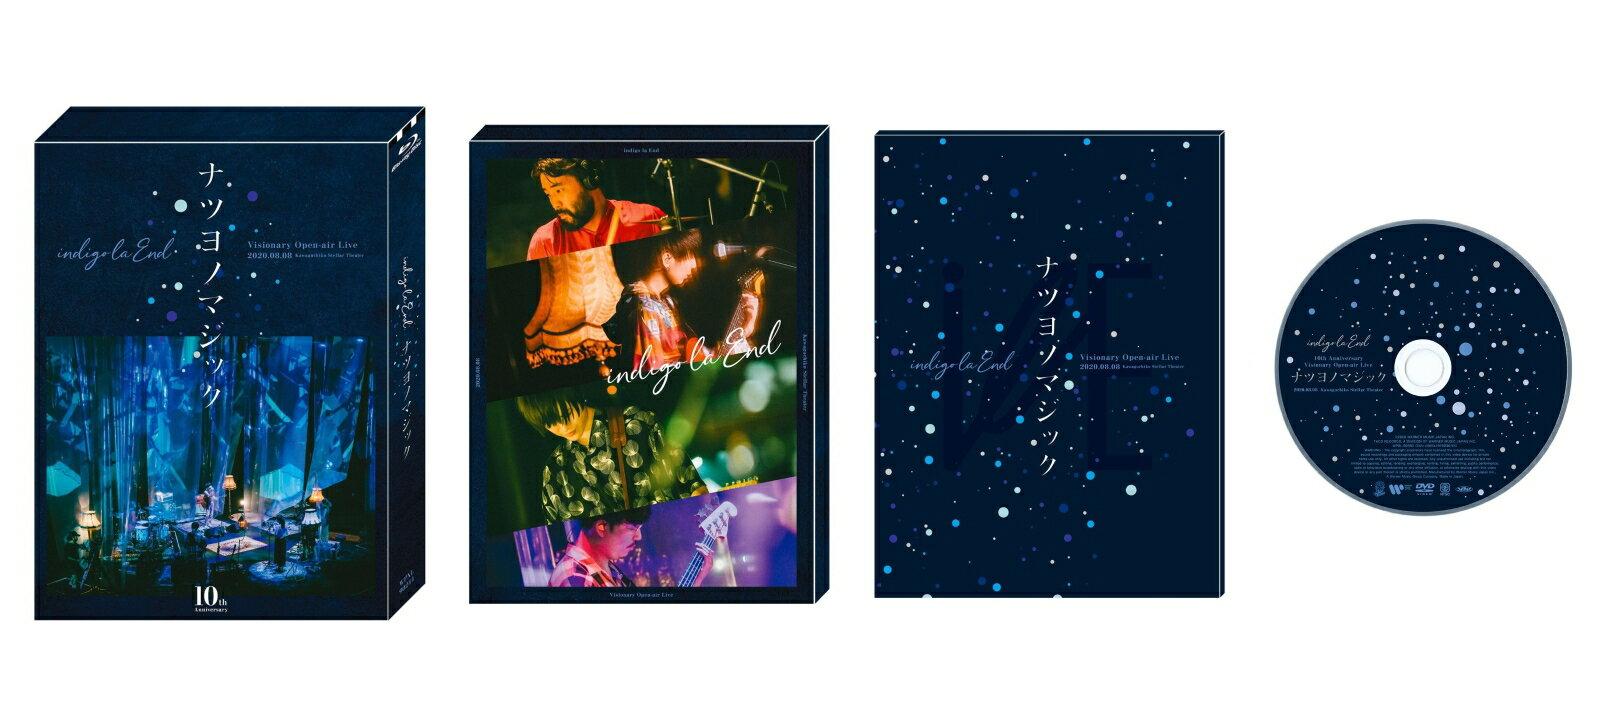 10th Anniversary Visionary Open-air Live ナツヨノマジック画像